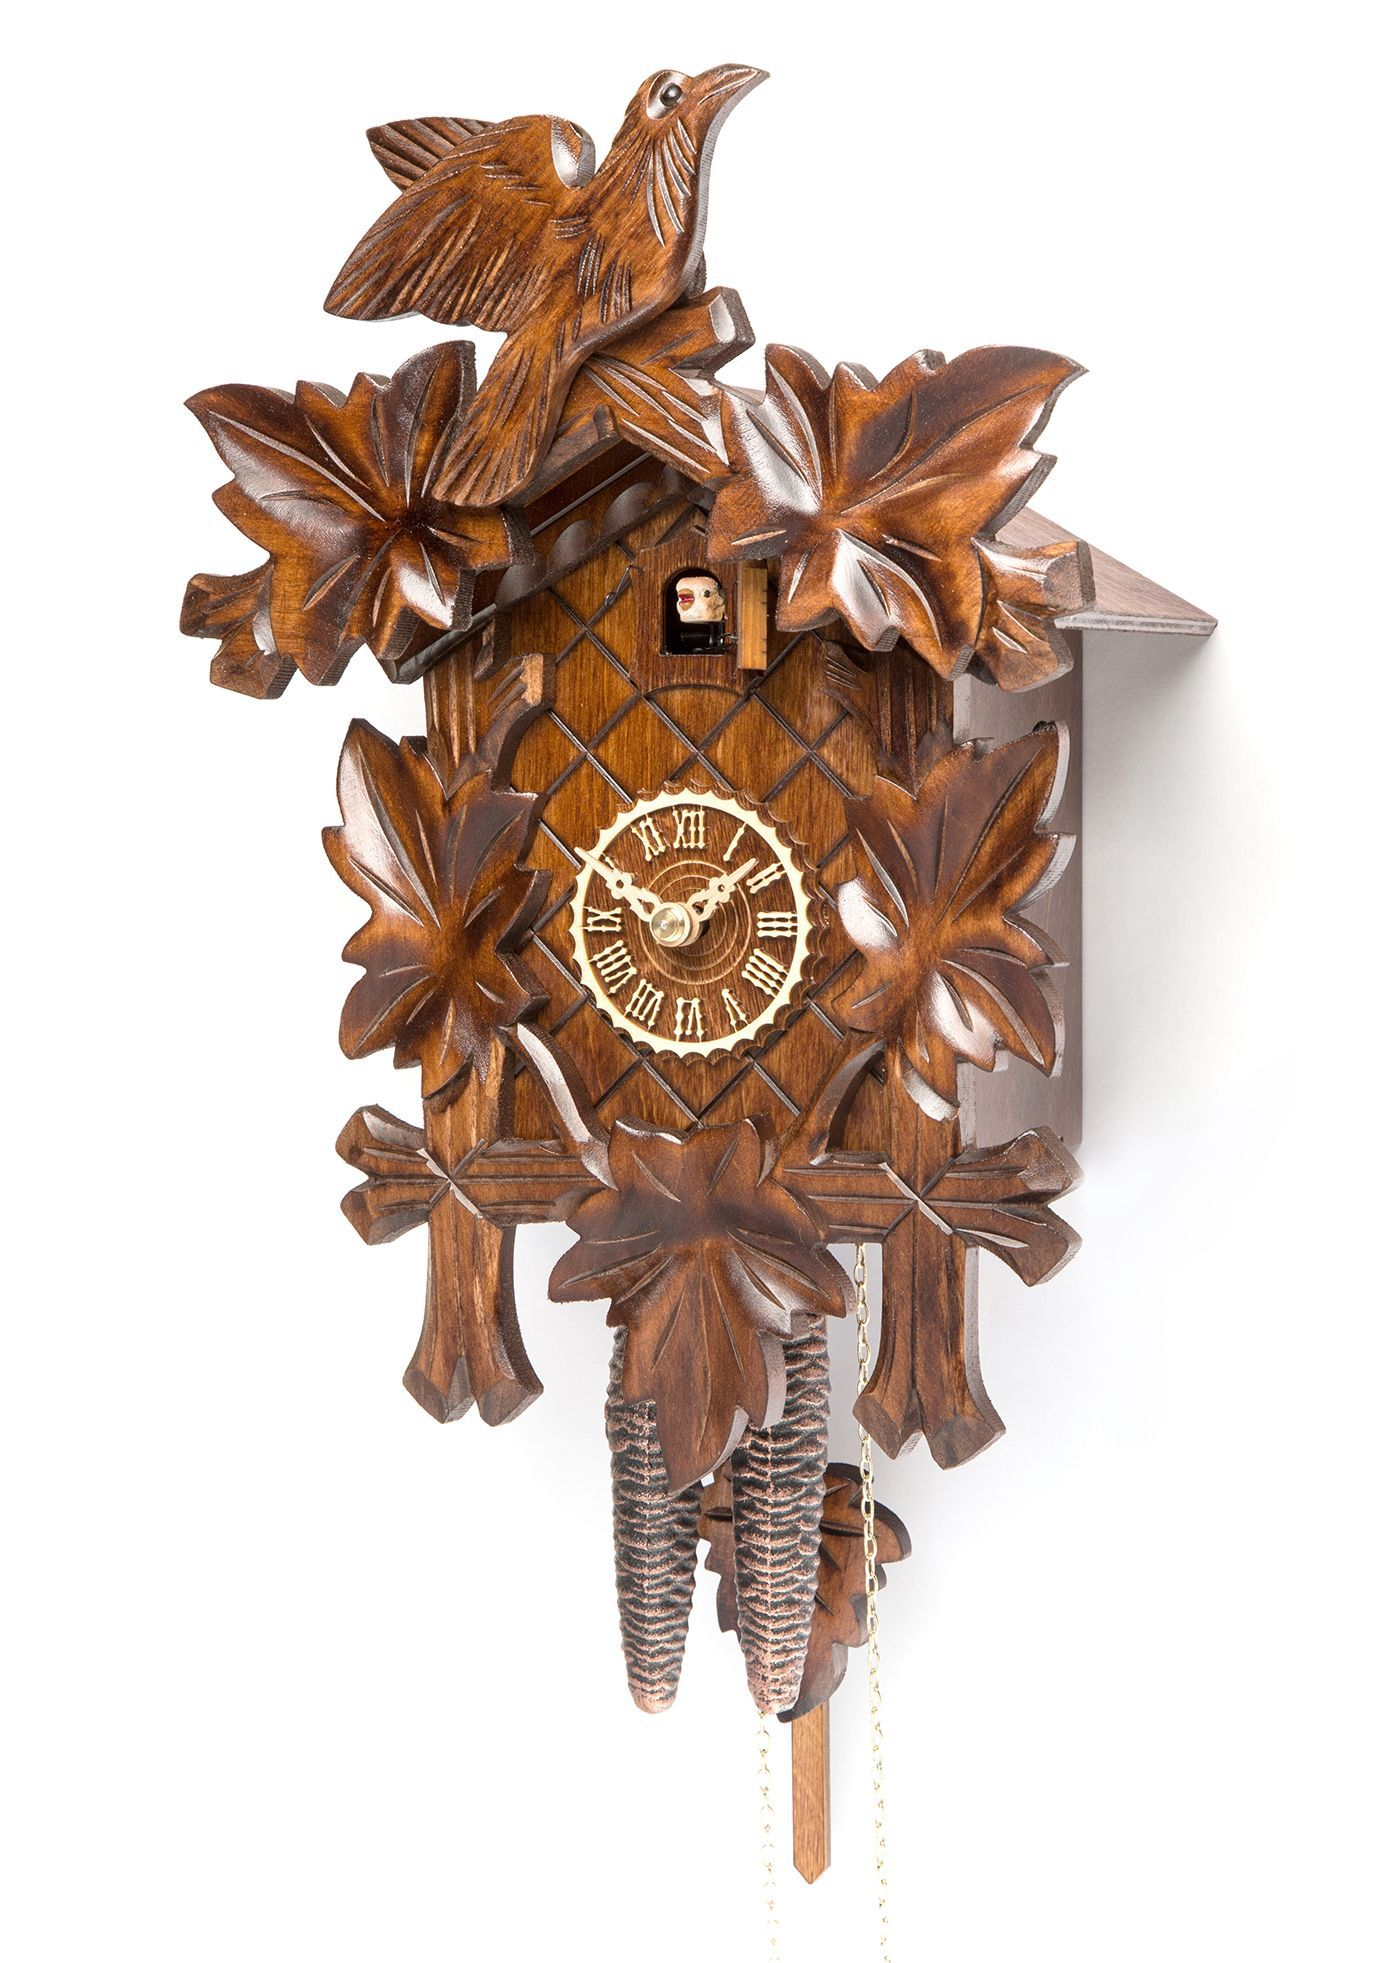 Часы настенные Часы настенные с кукушкой Tomas Stern 5007 chasy-nastennye-s-kukushkoy-tomas-stern-5007-germaniya.jpg